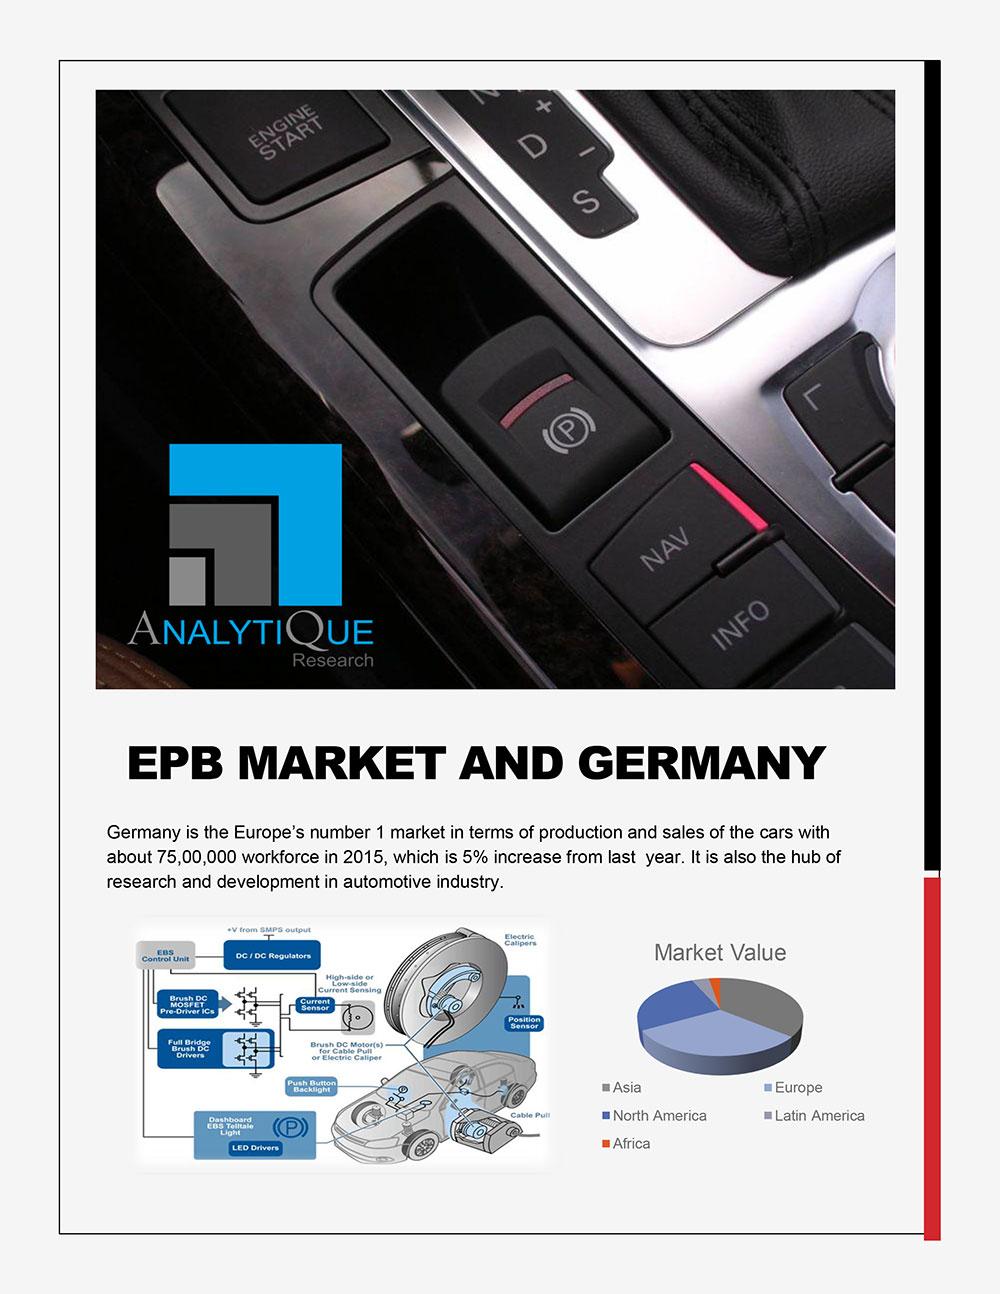 Electronic-Parking-Break-and-Shaft-Market-Scenario-in-Germany-1